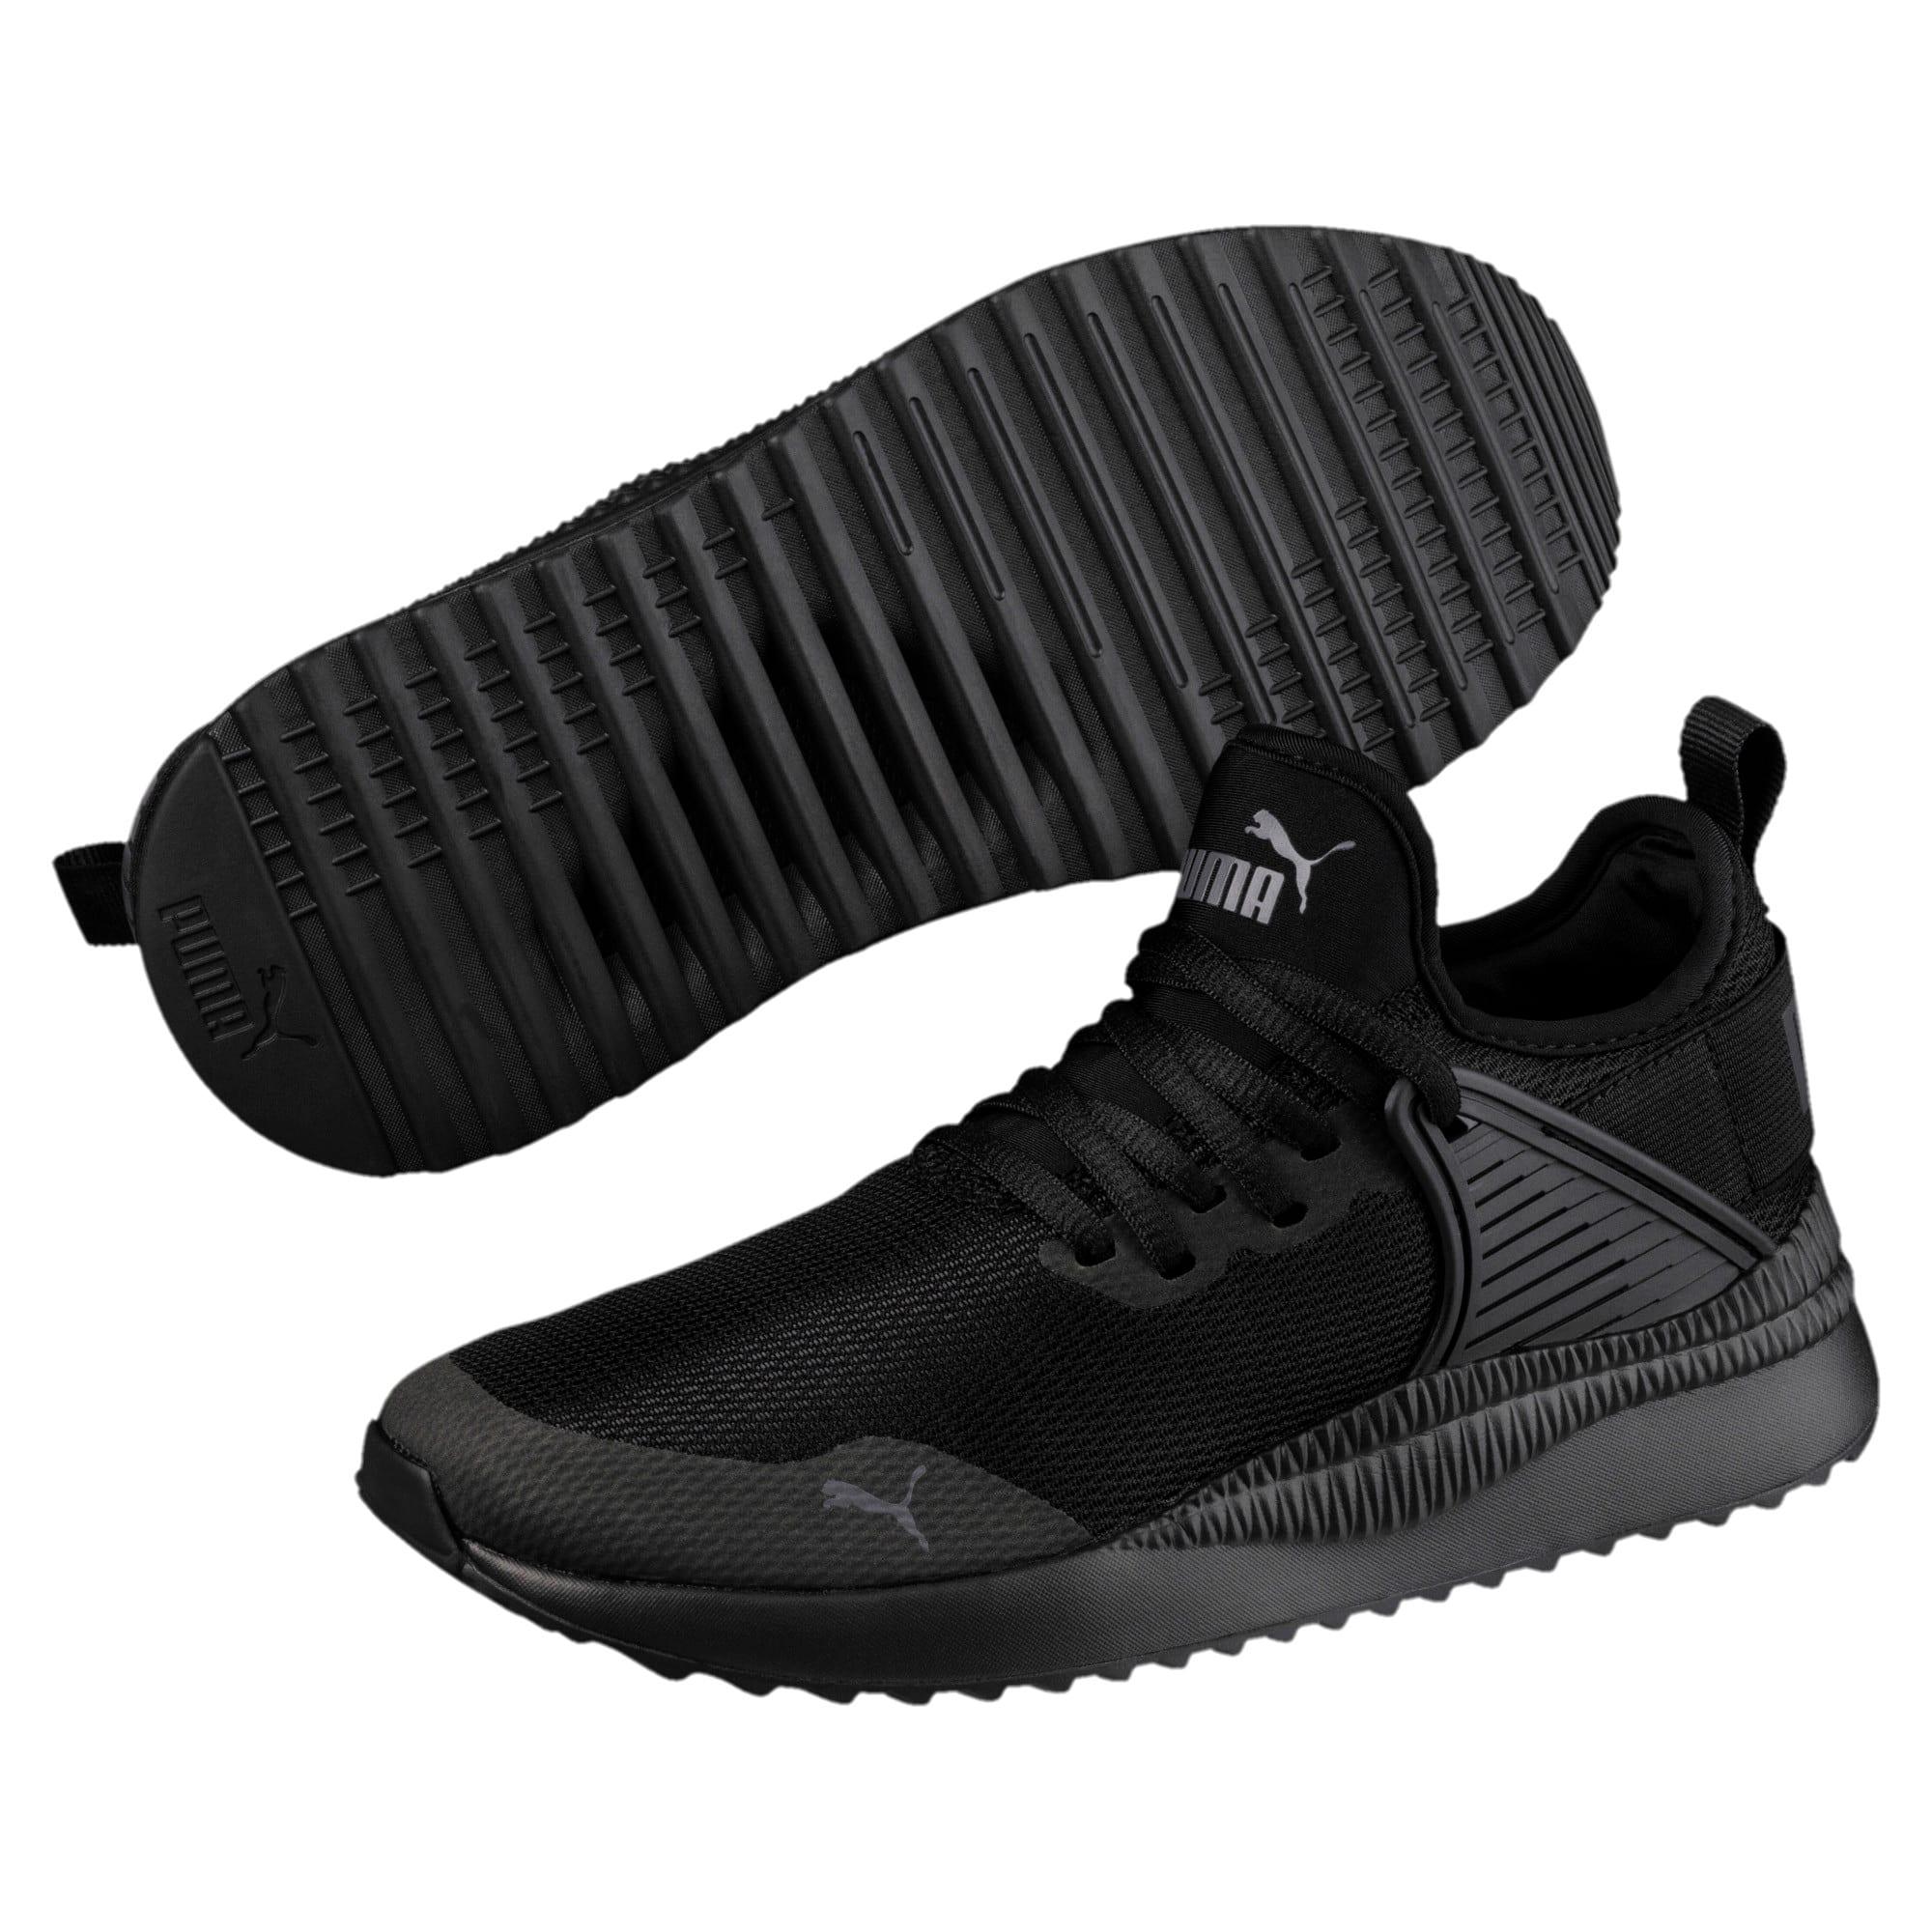 Thumbnail 2 of Pacer Next Cage Sneakers JR, Puma Black-Puma Black, medium